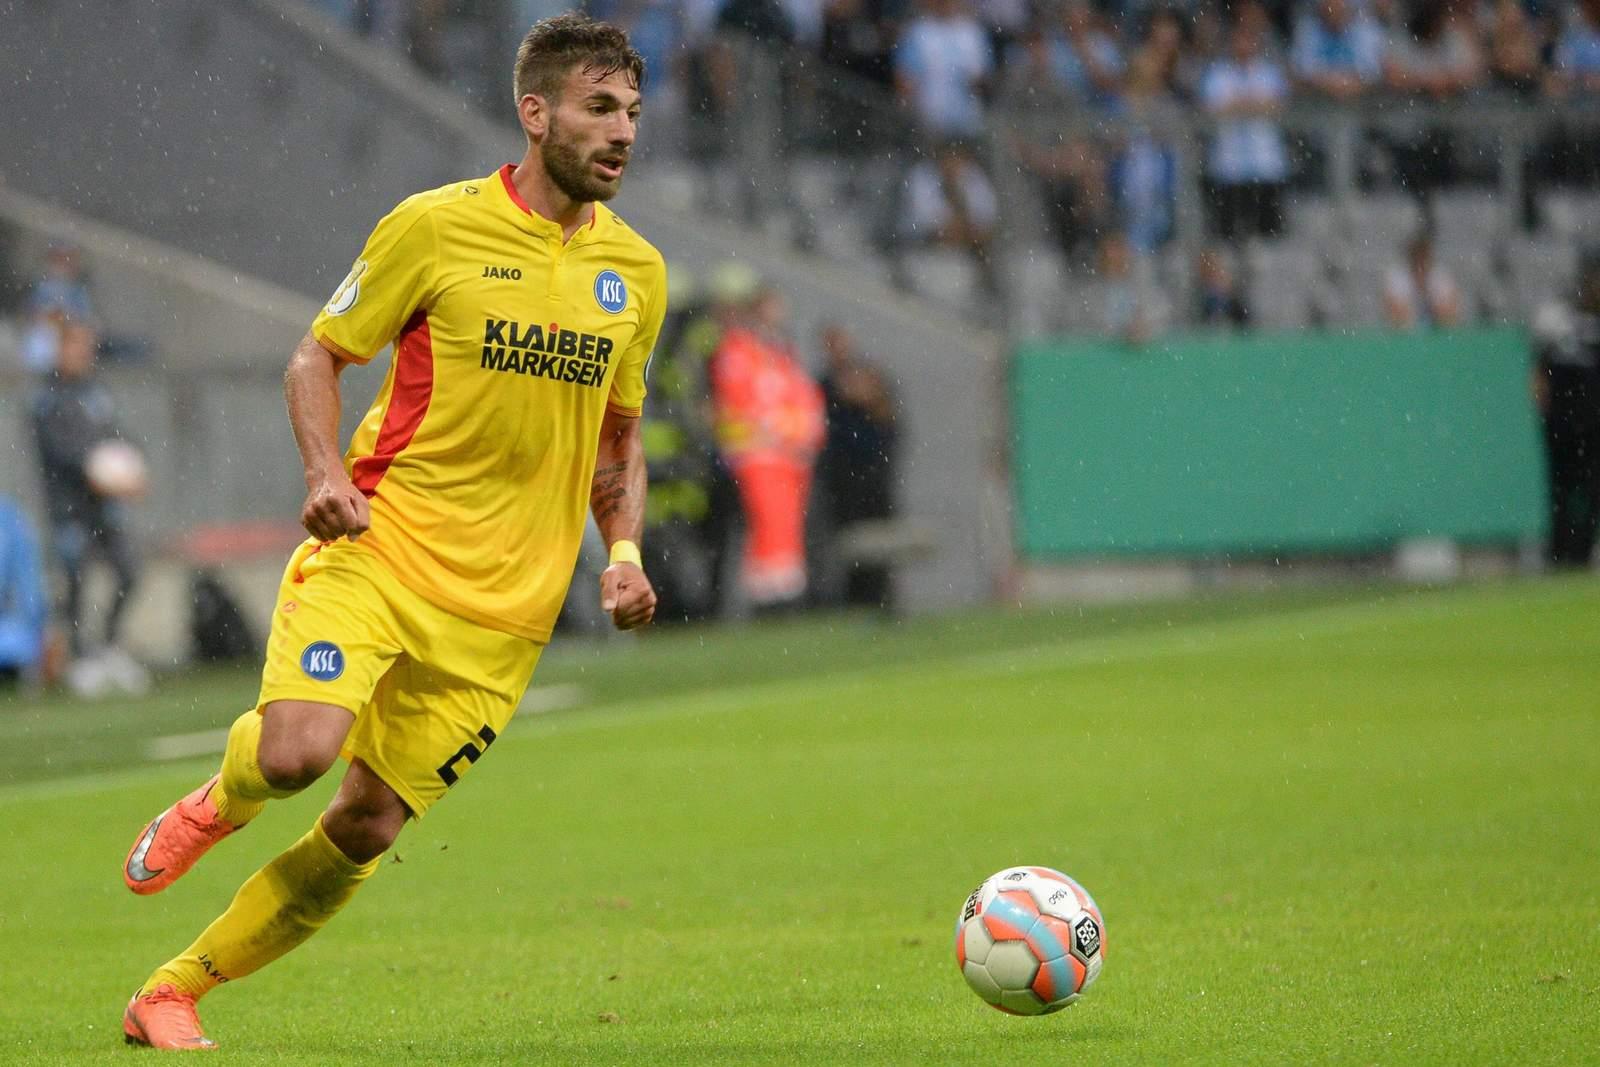 Enrico Valentini vom Karlsruher SC